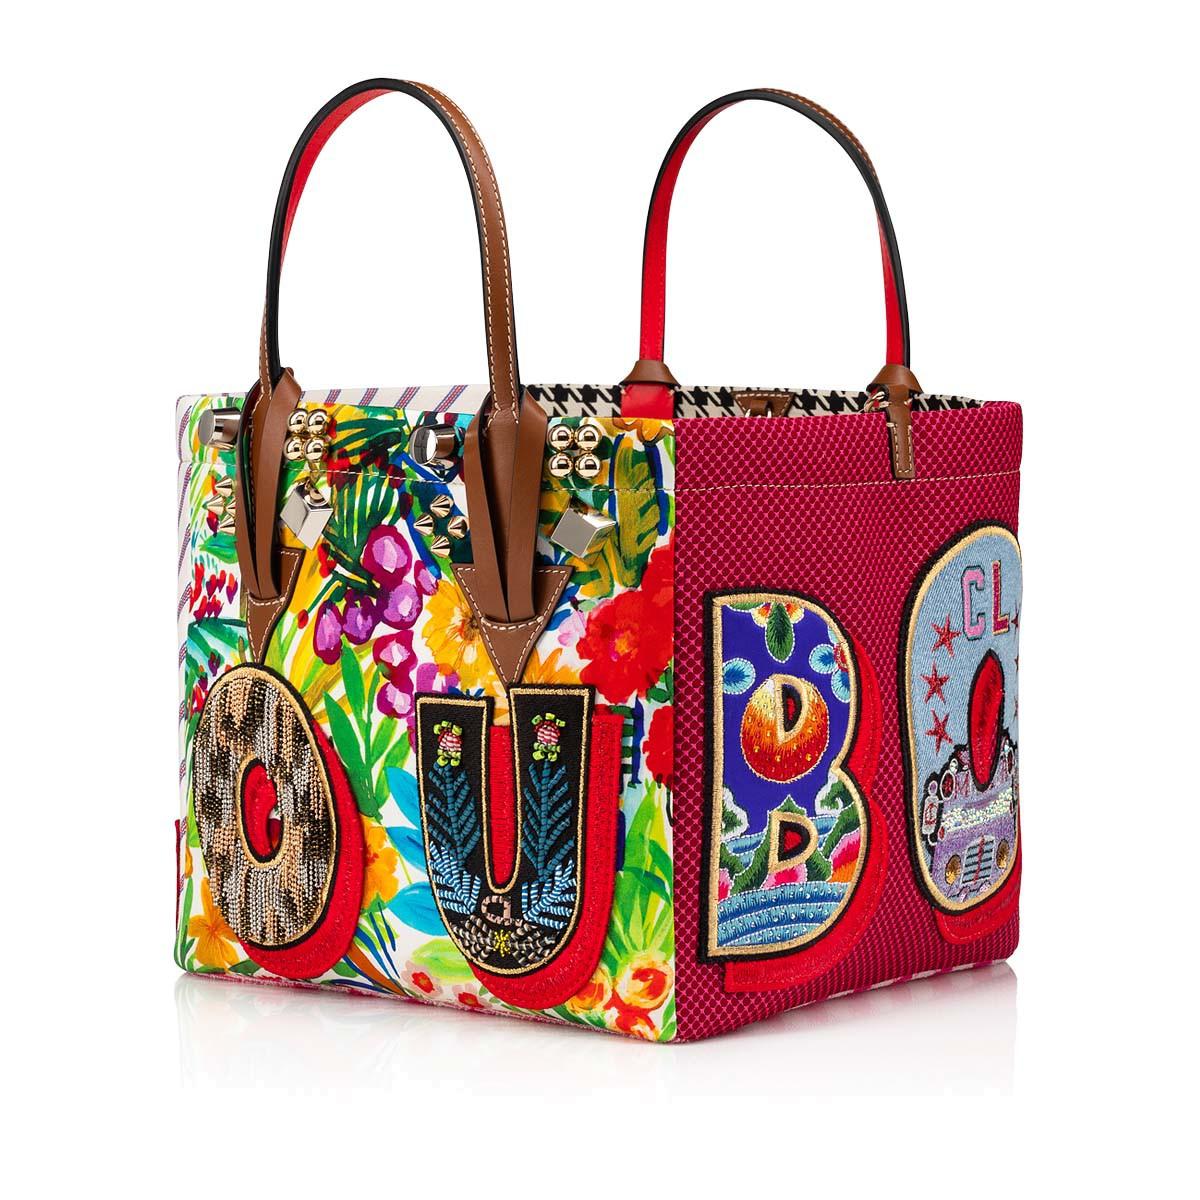 Bags - Caracaba Petit Modele - Christian Louboutin